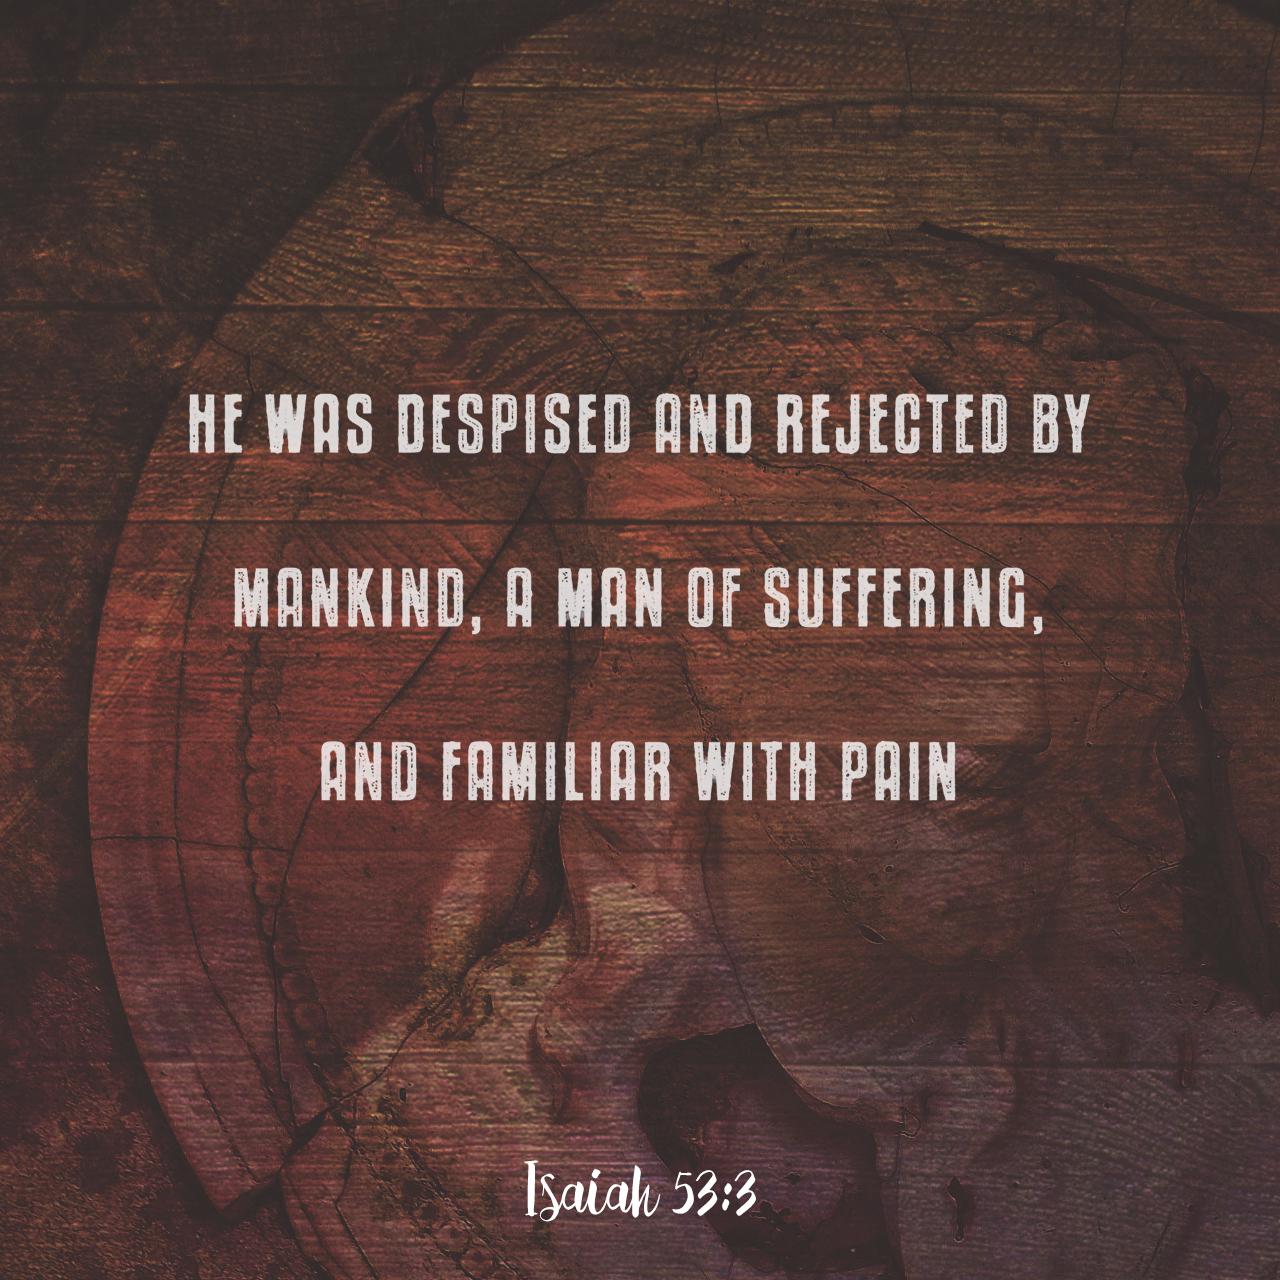 Isaiah 53:3